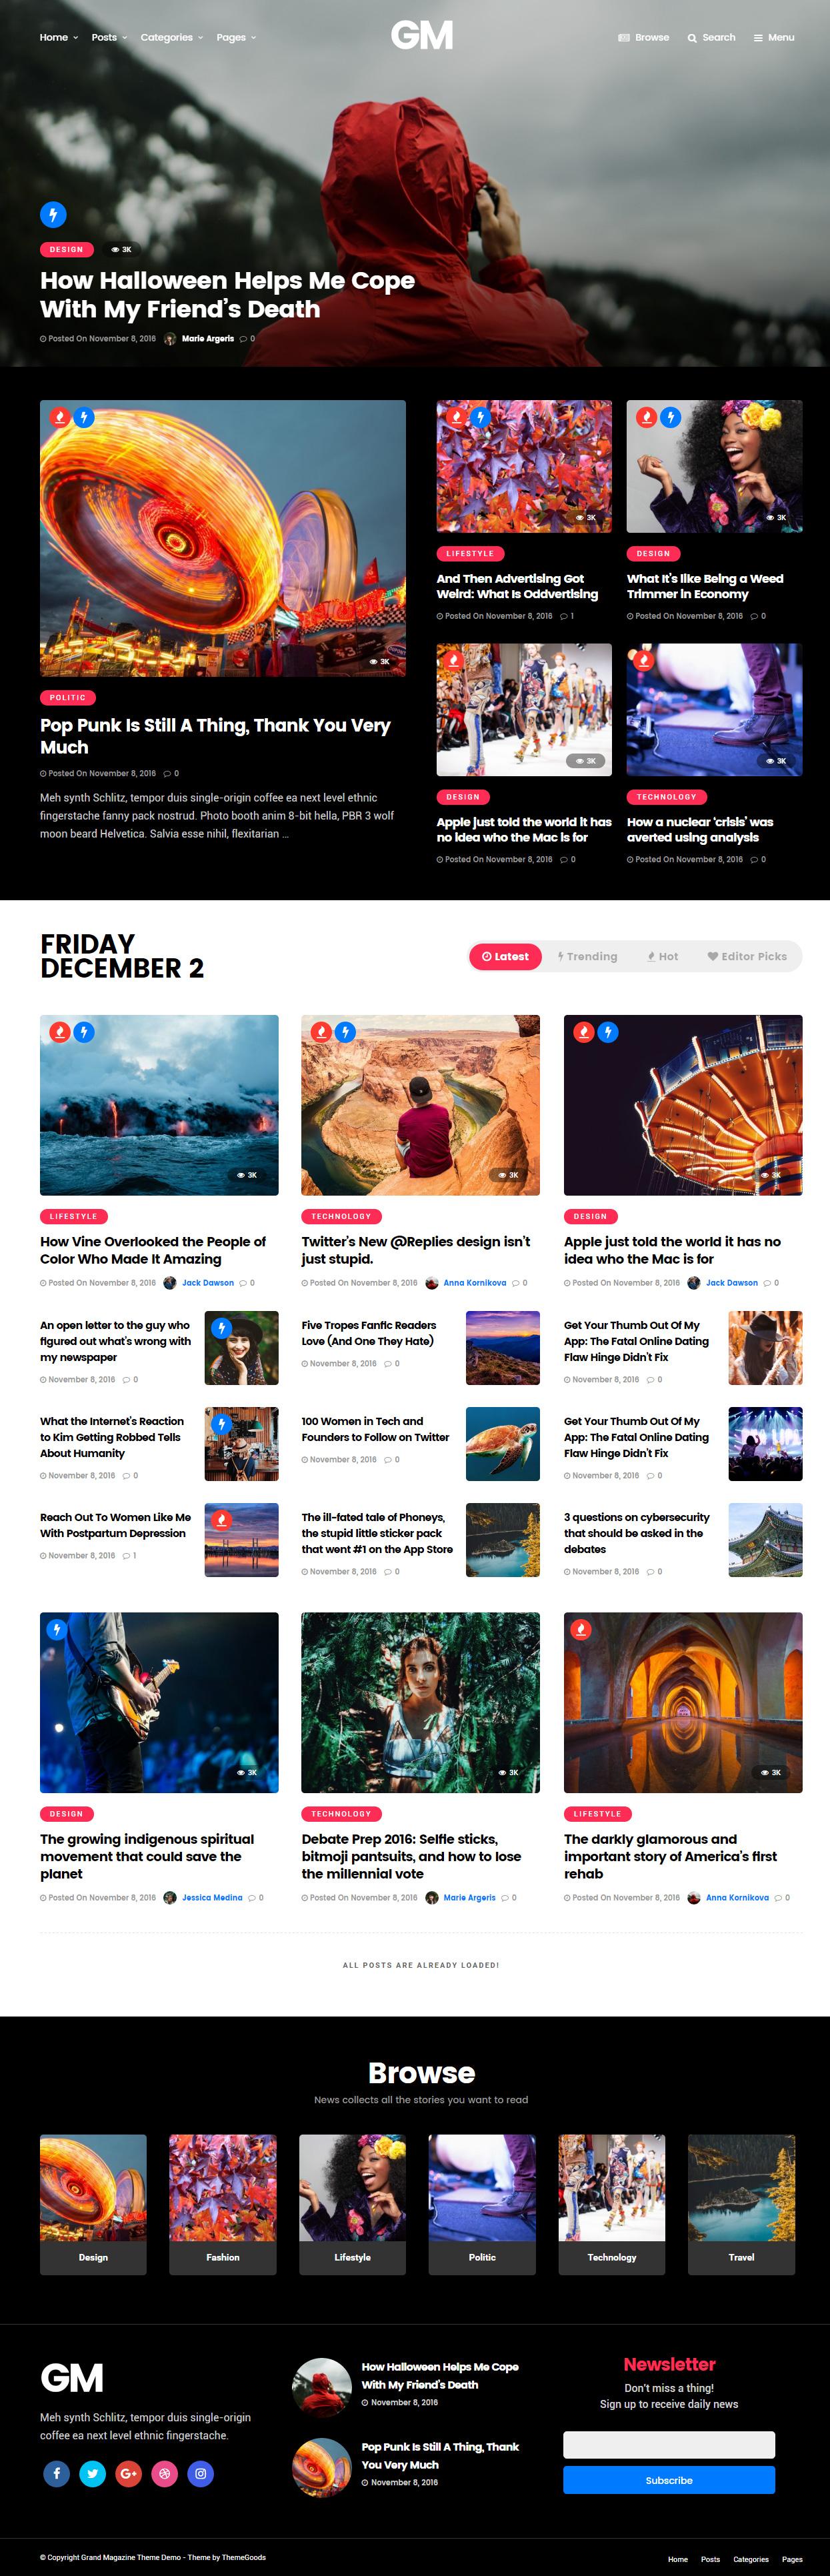 40 Best Wordpress Magazine Themes 2017 - Responsive Miracle